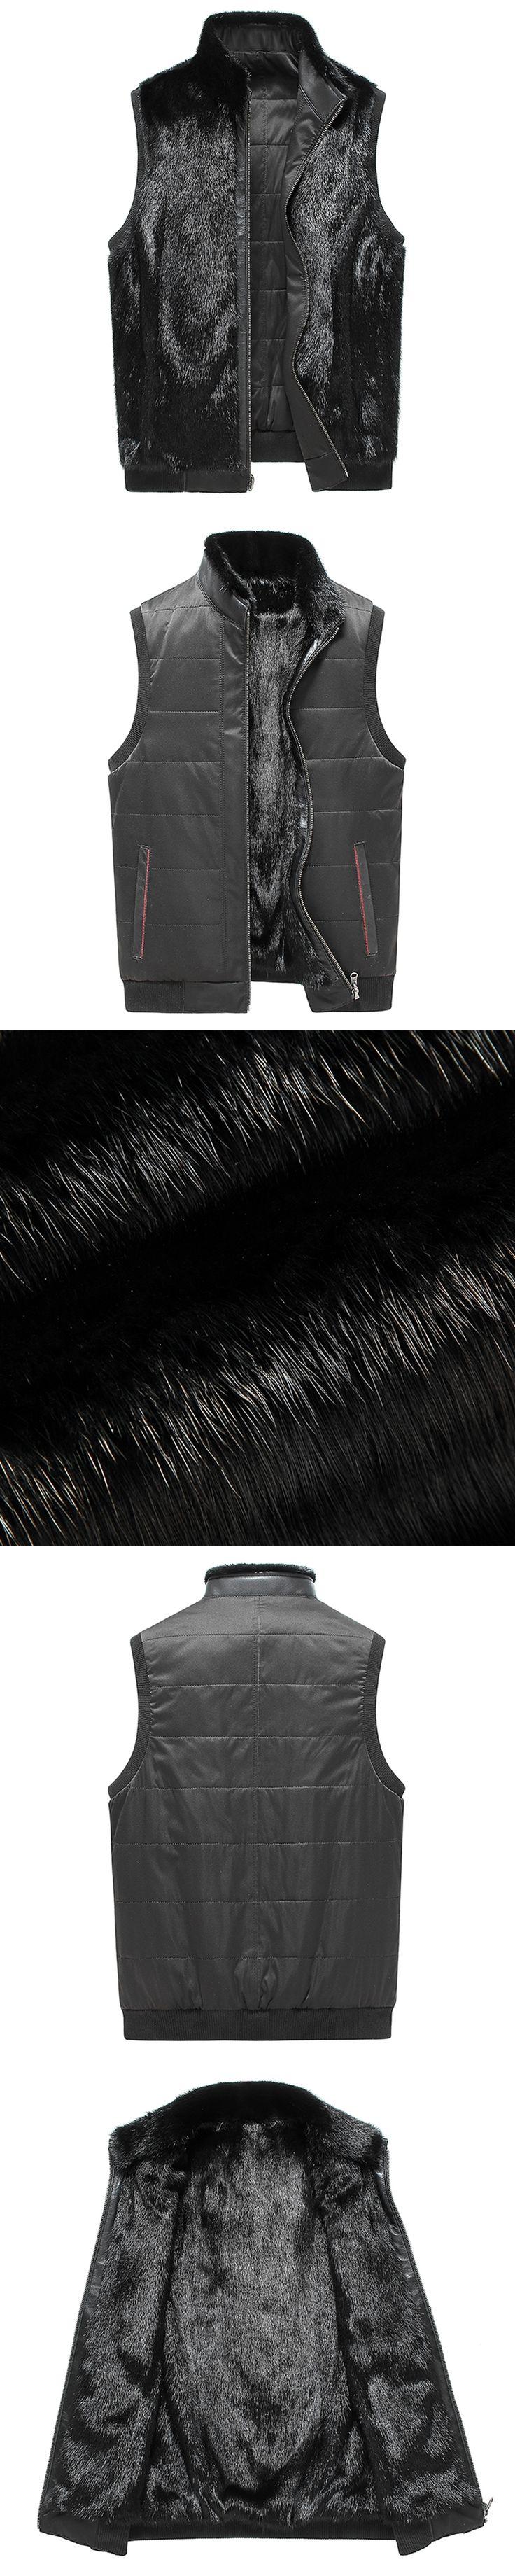 Black Leather Vest Men Shearling Sheepskin Coat Fashion Short Motorcycle Outerwear Genuine Leather Vest